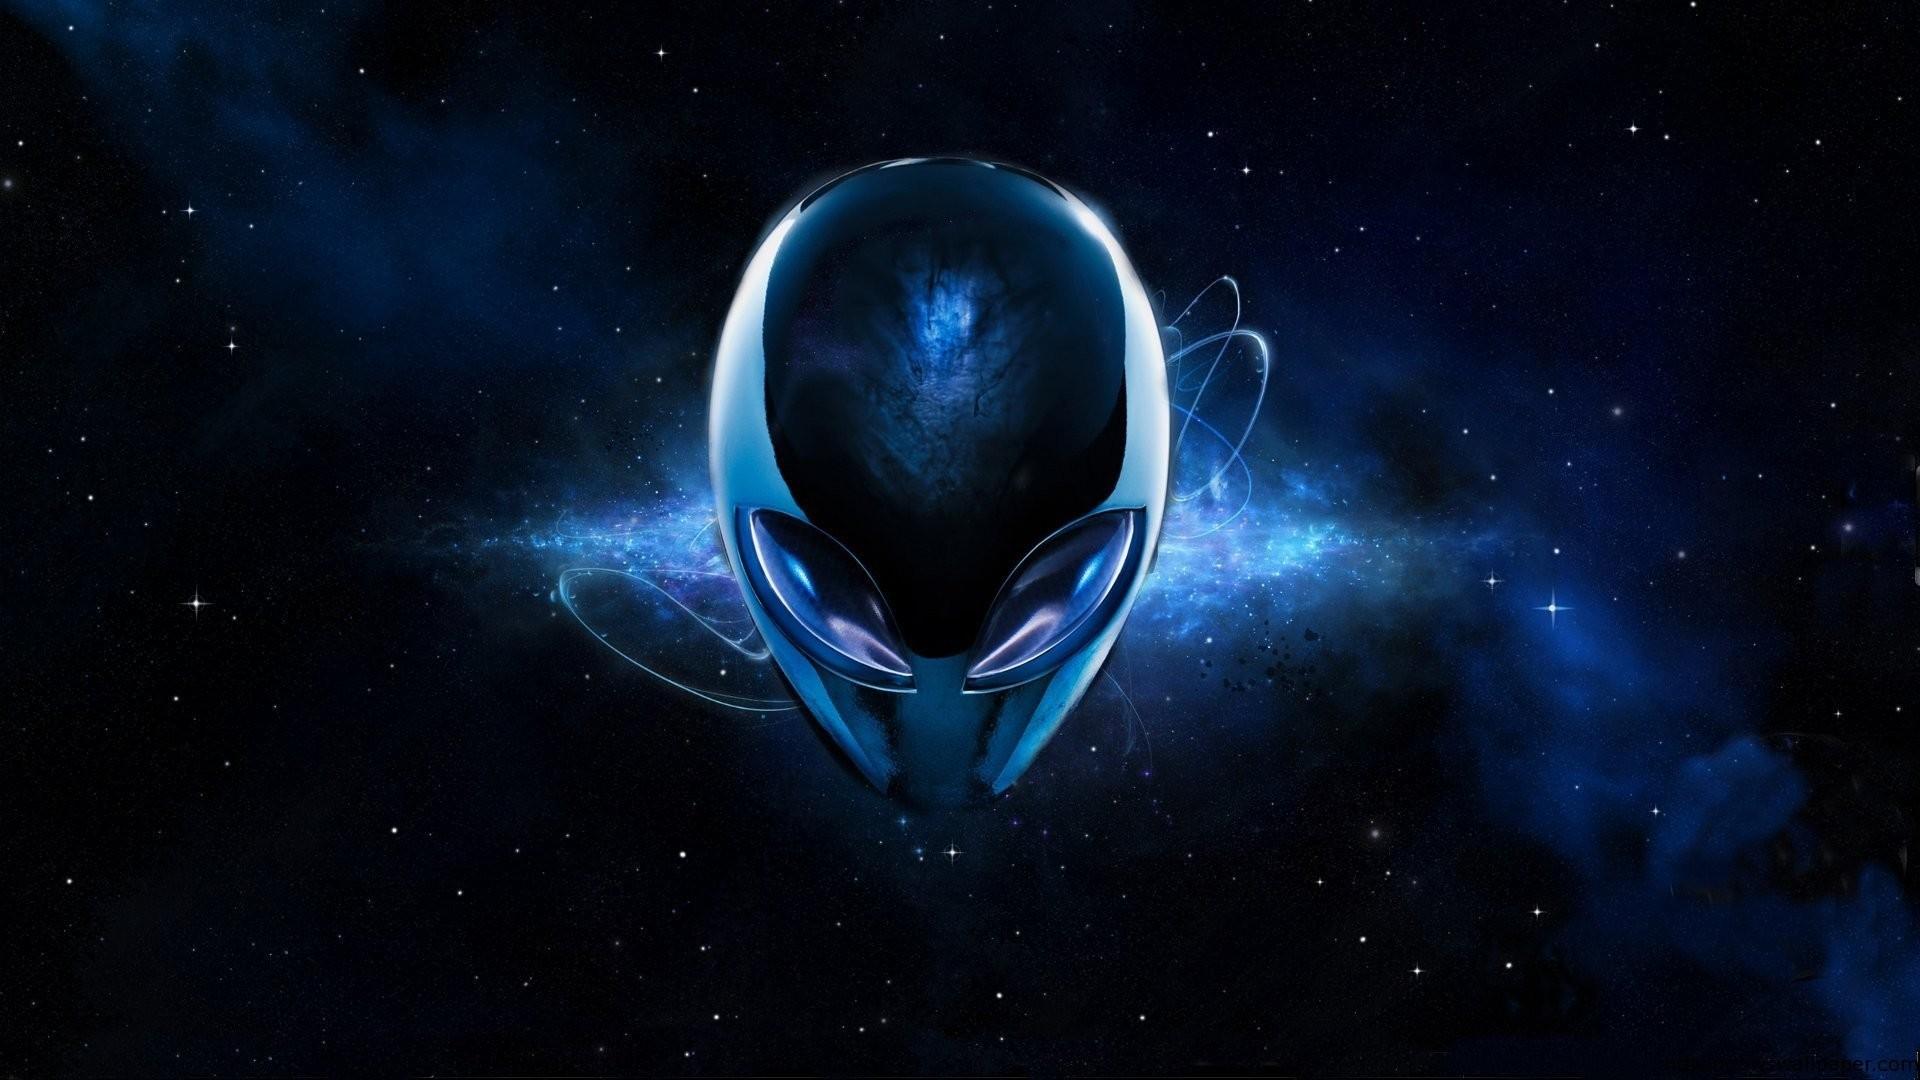 … DeviantArt Blue Alien Wallpaper